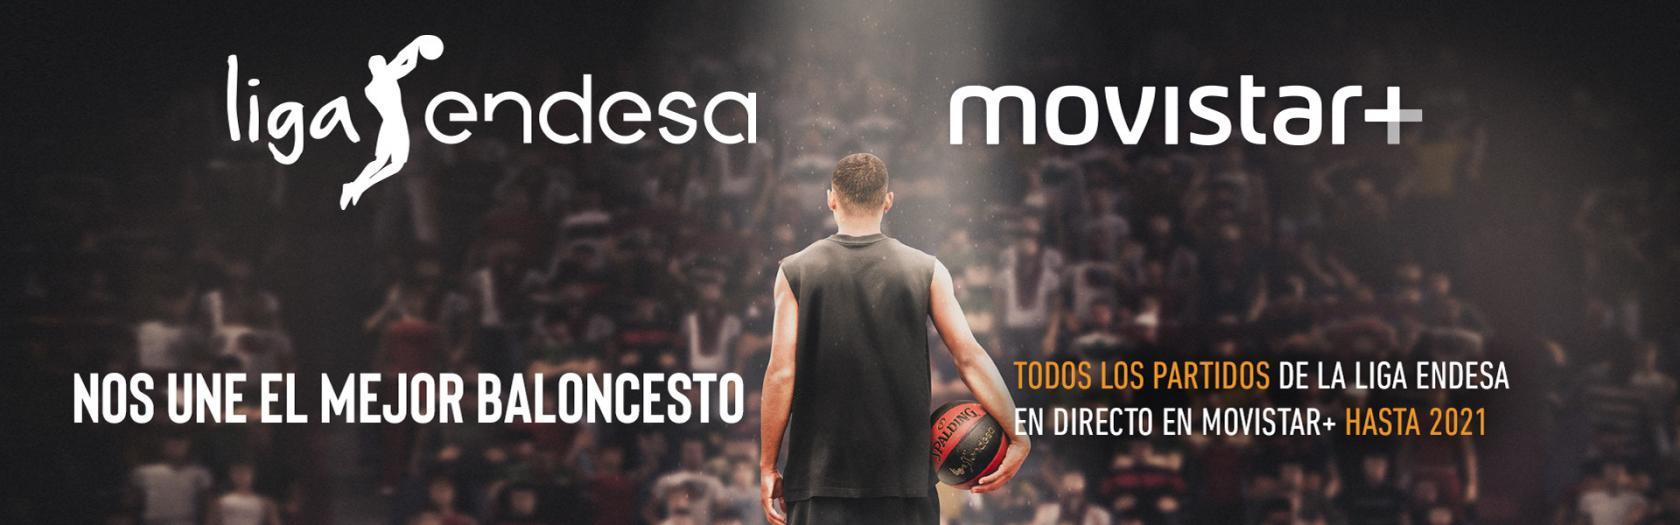 Web Oficial del Unicaja Baloncesto